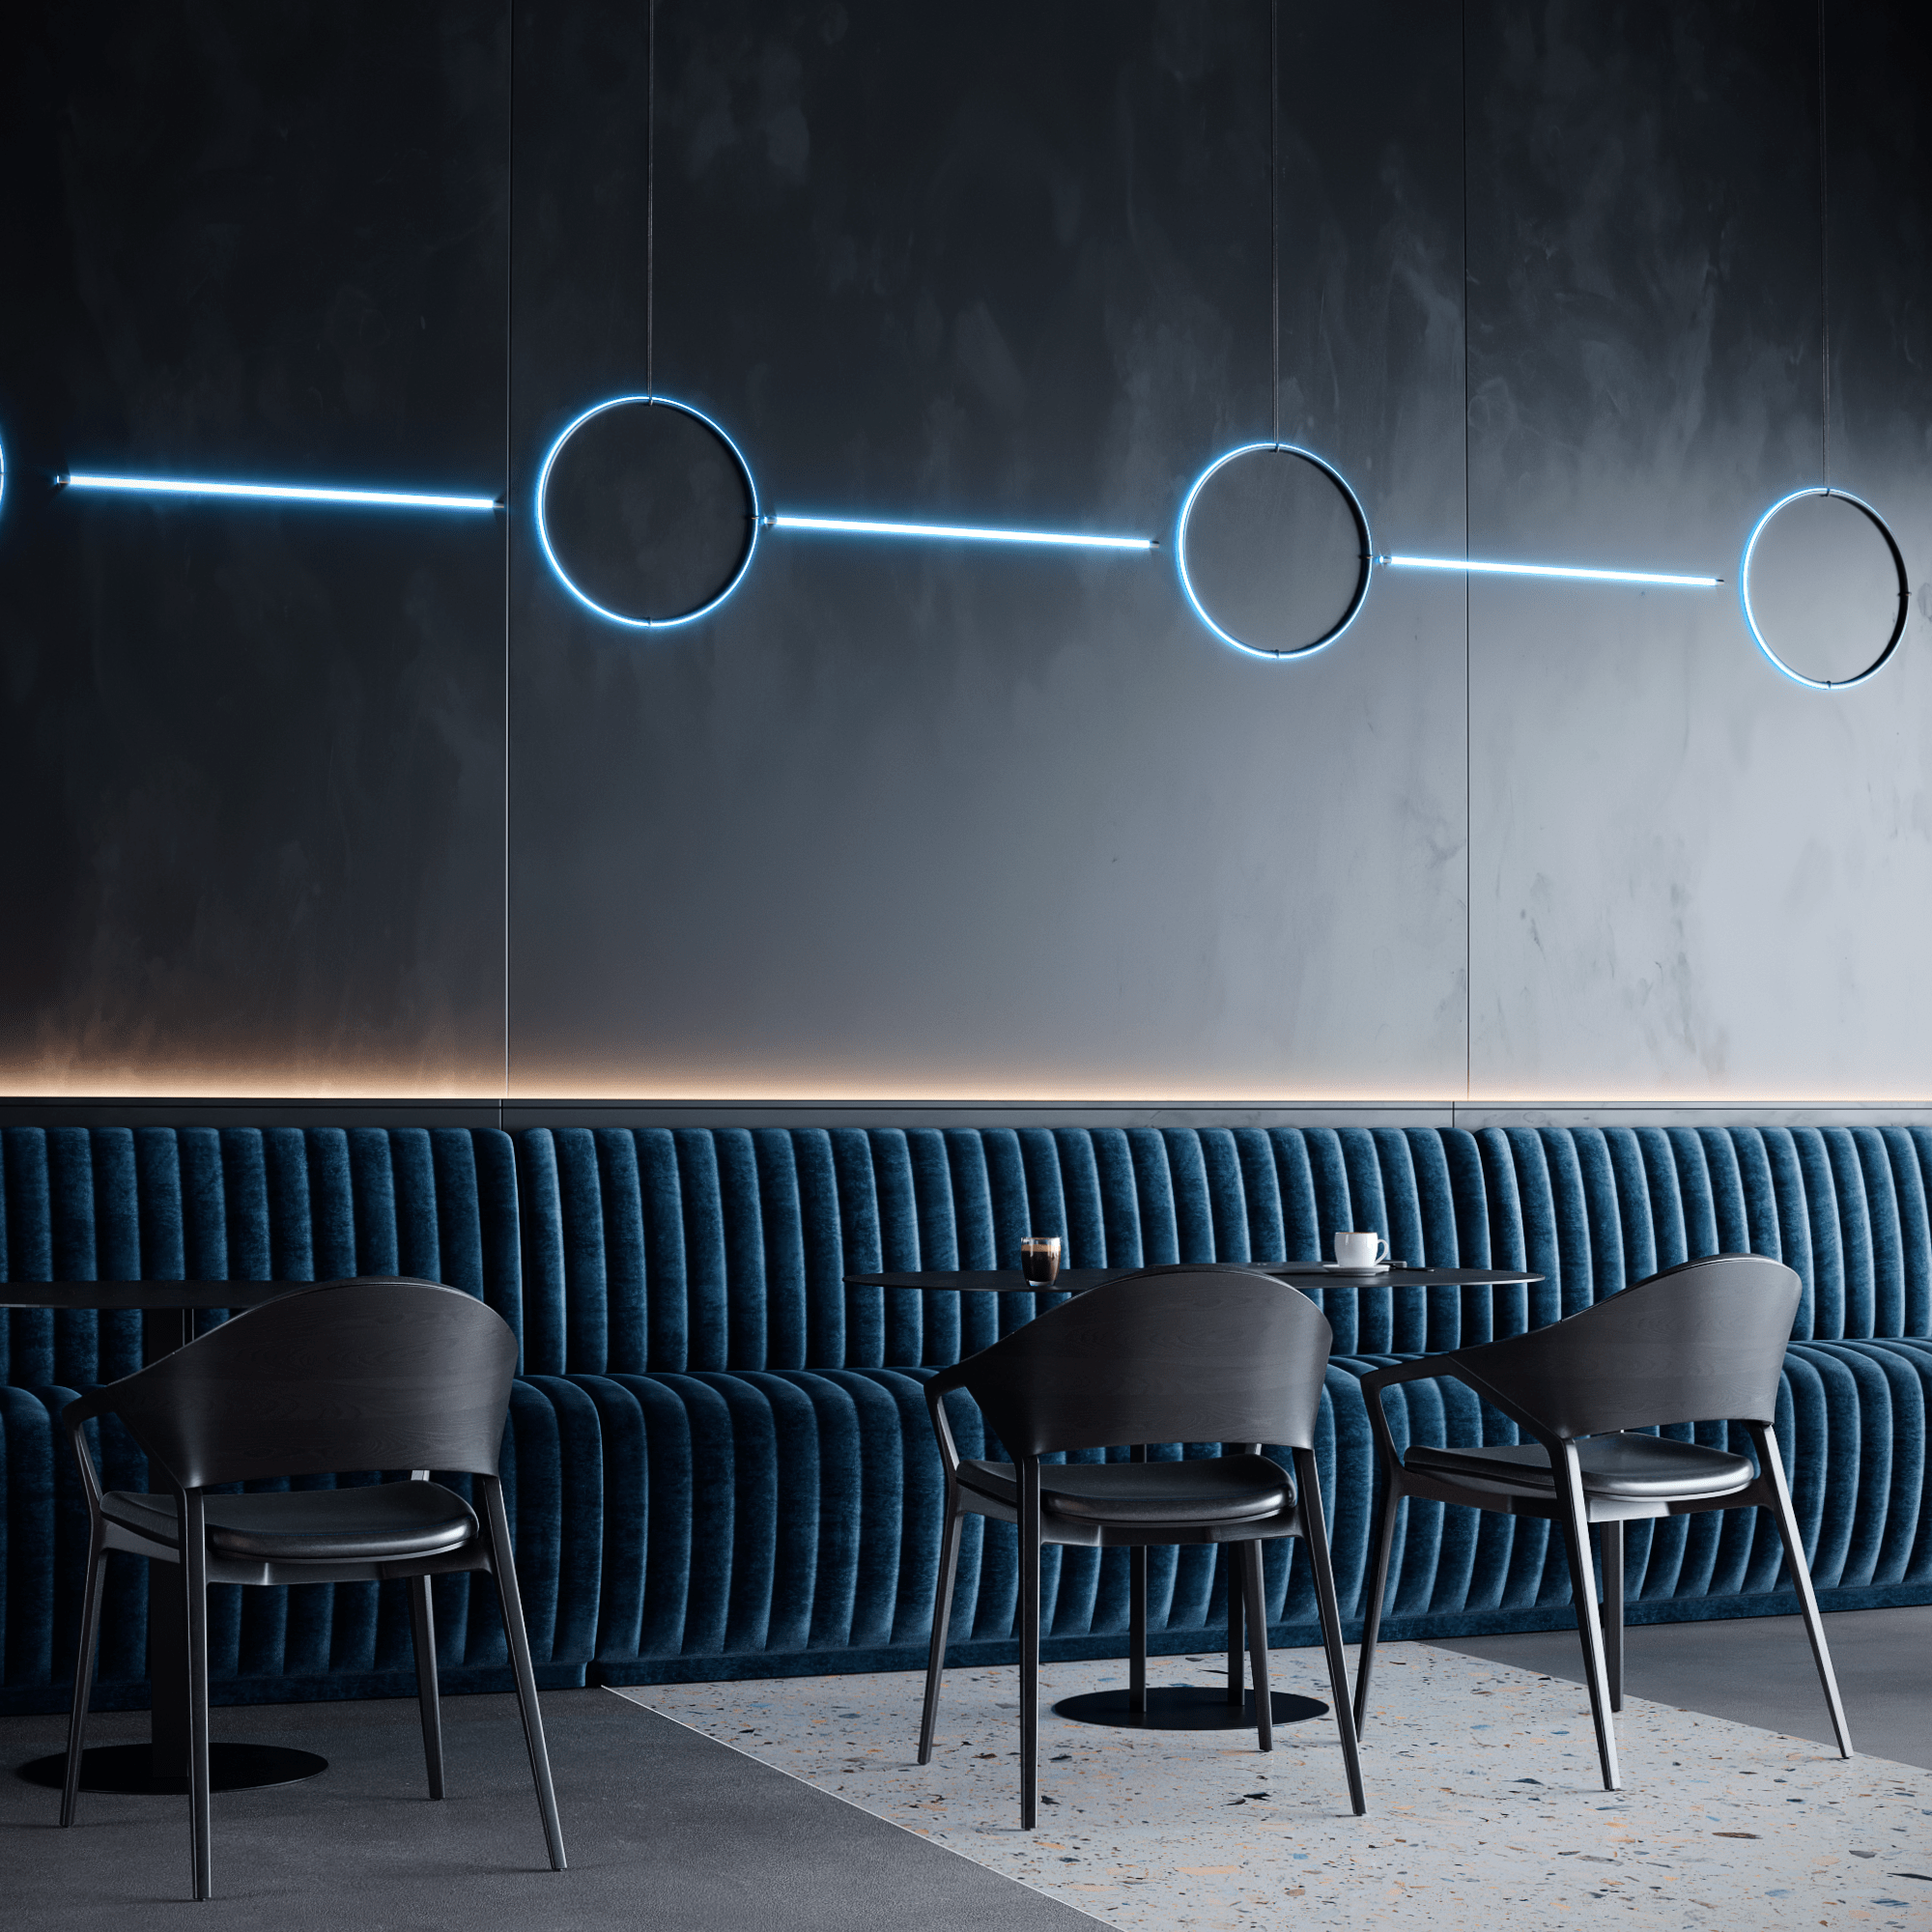 https://studioautograph.com/wp-content/uploads/2021/02/studio-autograph-ltd-berlin-design-cafe5-min.png